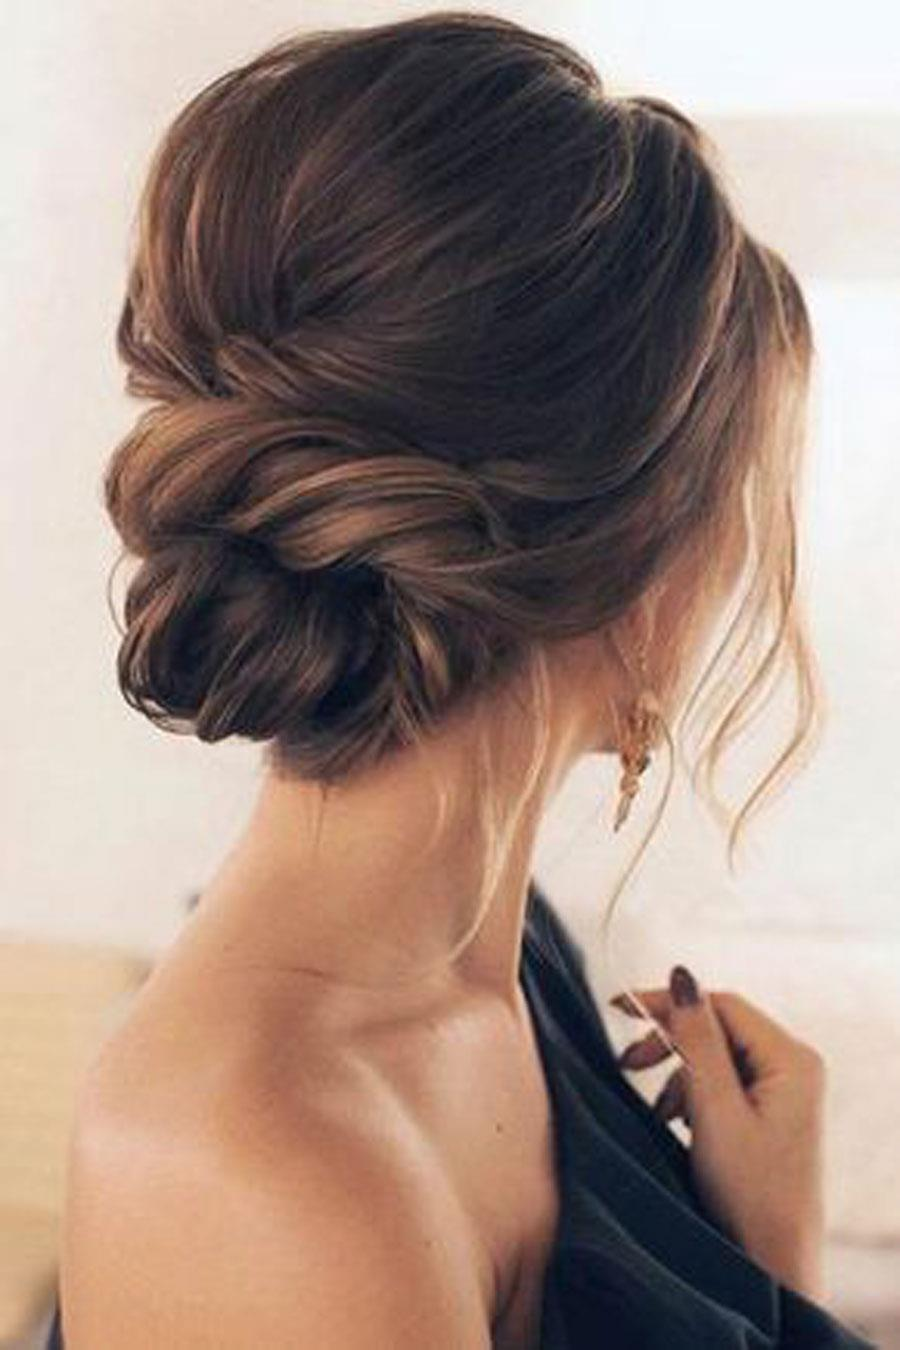 Peinados Invitada Boda Los Peinados De Moda Mas Bonitos Segun